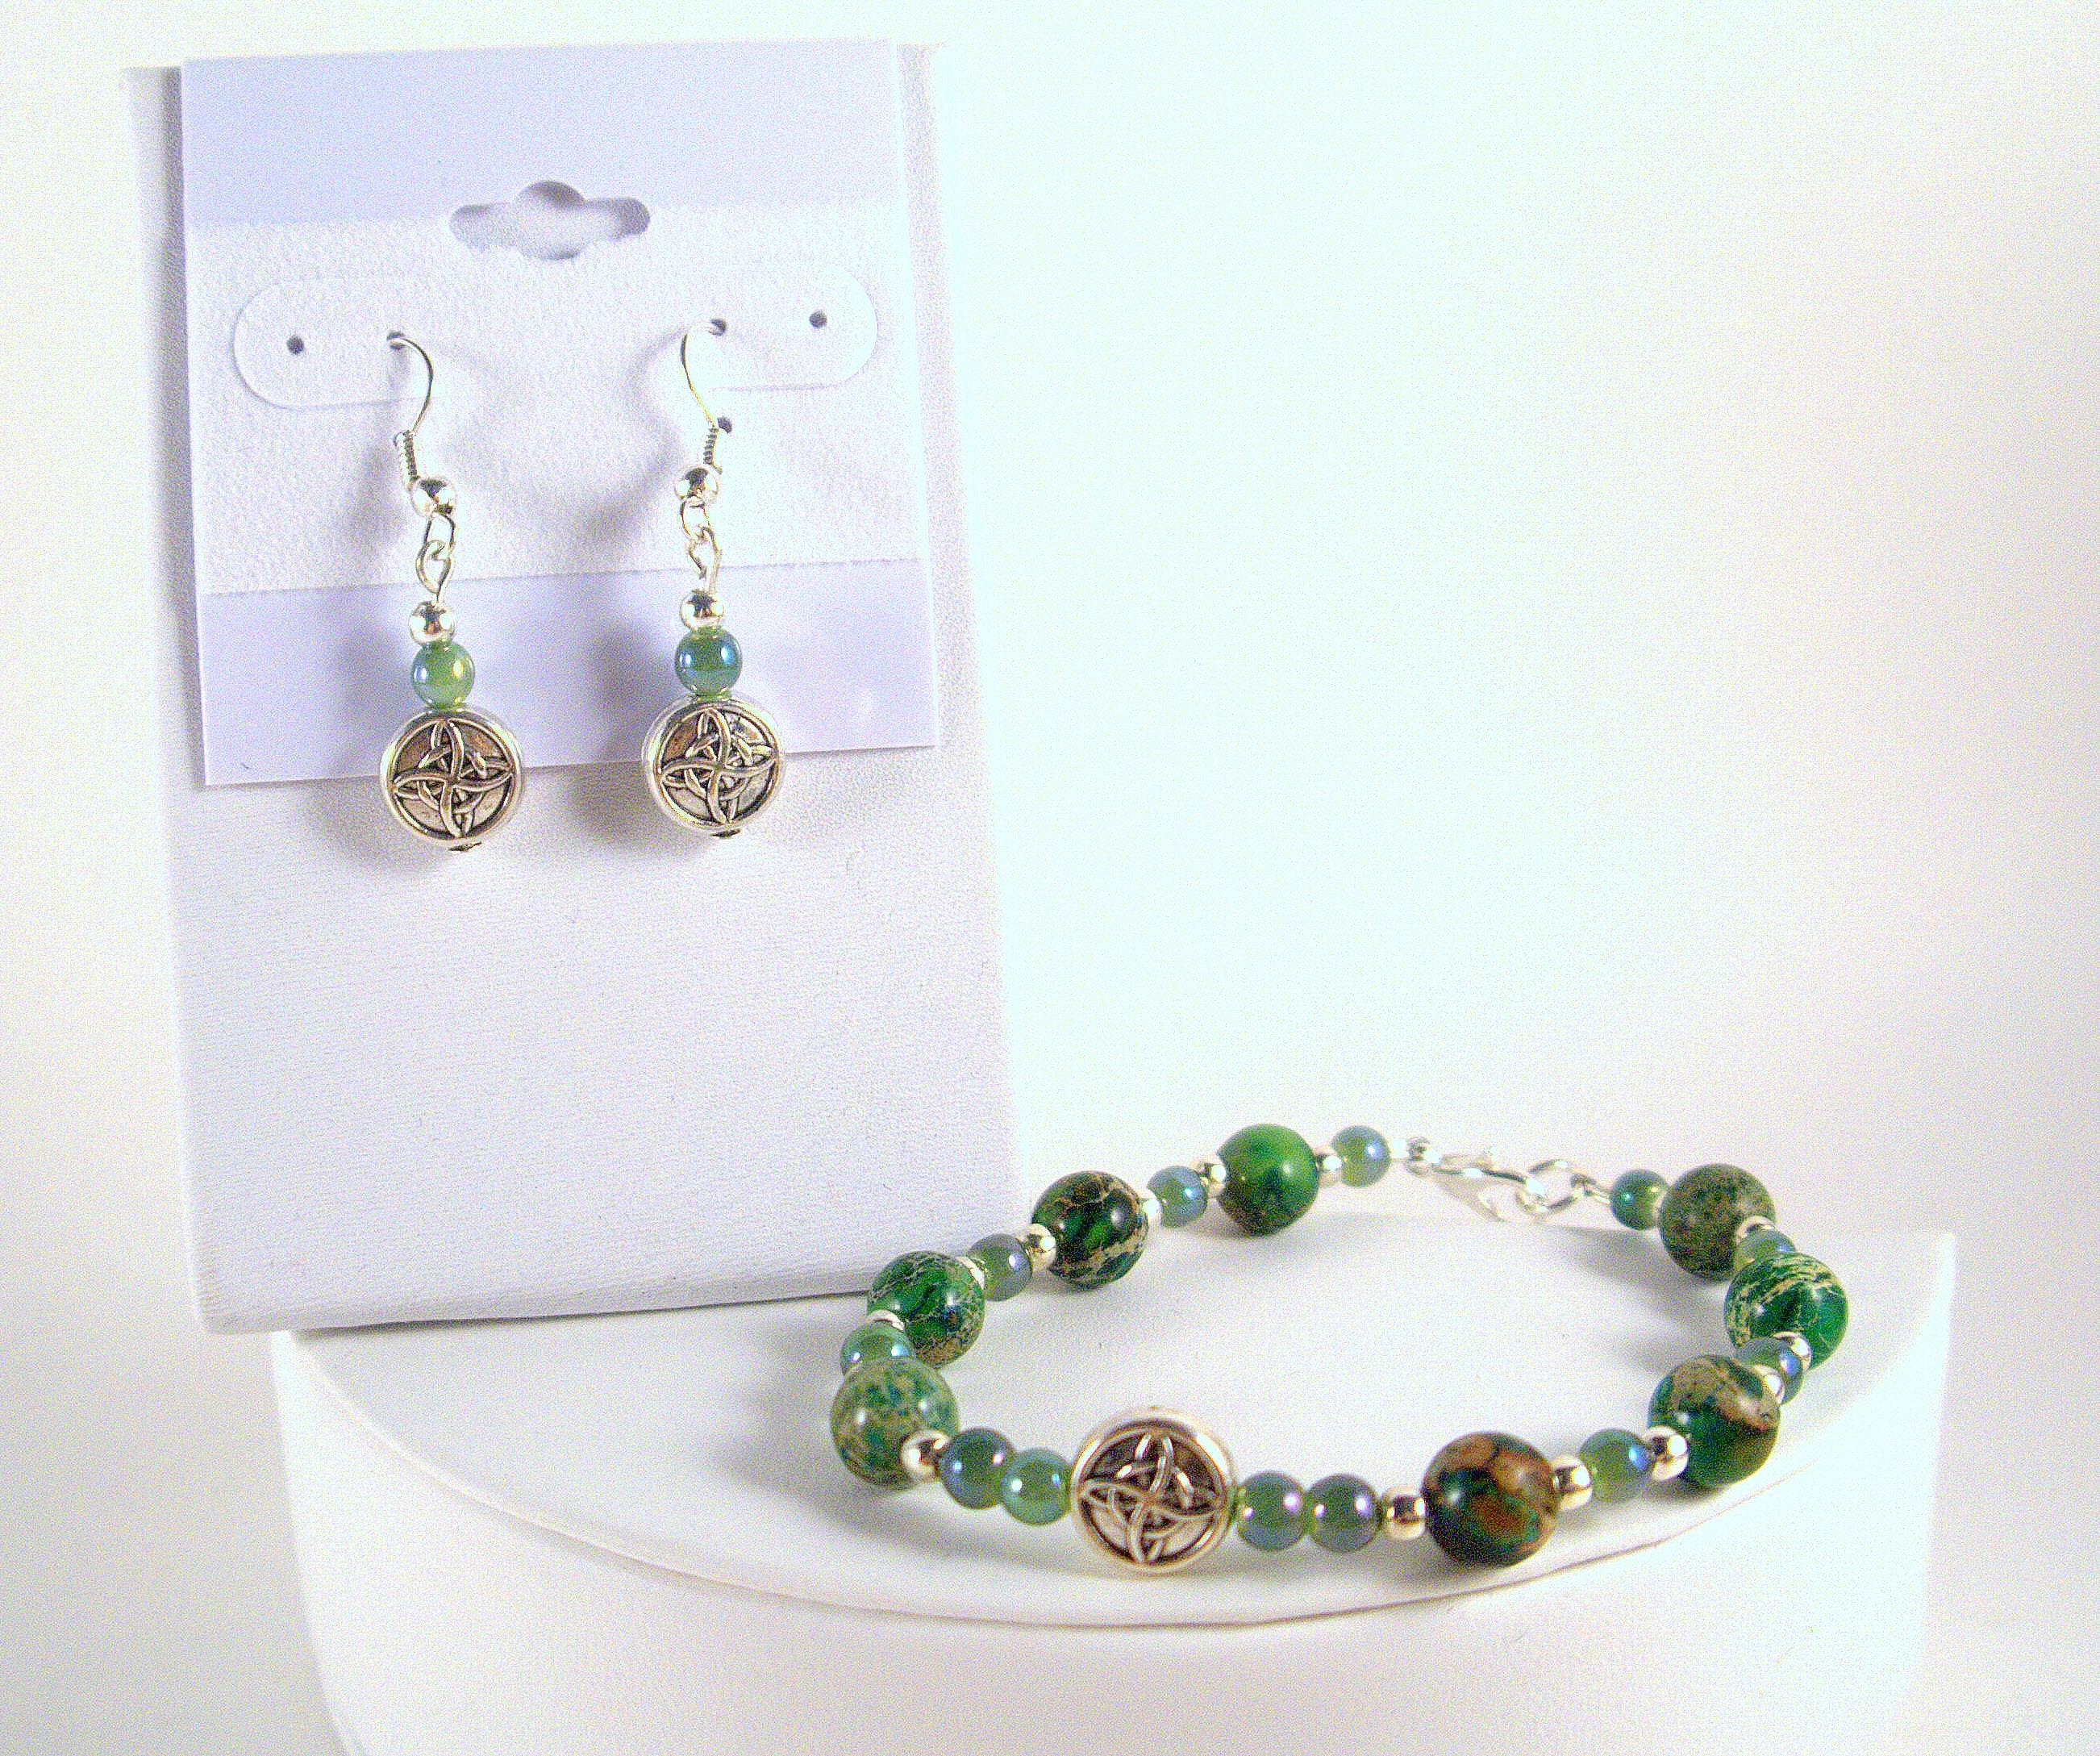 fa71197b5 Celtic Knot Charm Irish Bracelet & Earrings - Celtic Charms Irish Earrings Celtic  Bracelet -Saint Patricks Day Good Luck Jewelry Irish Gifts